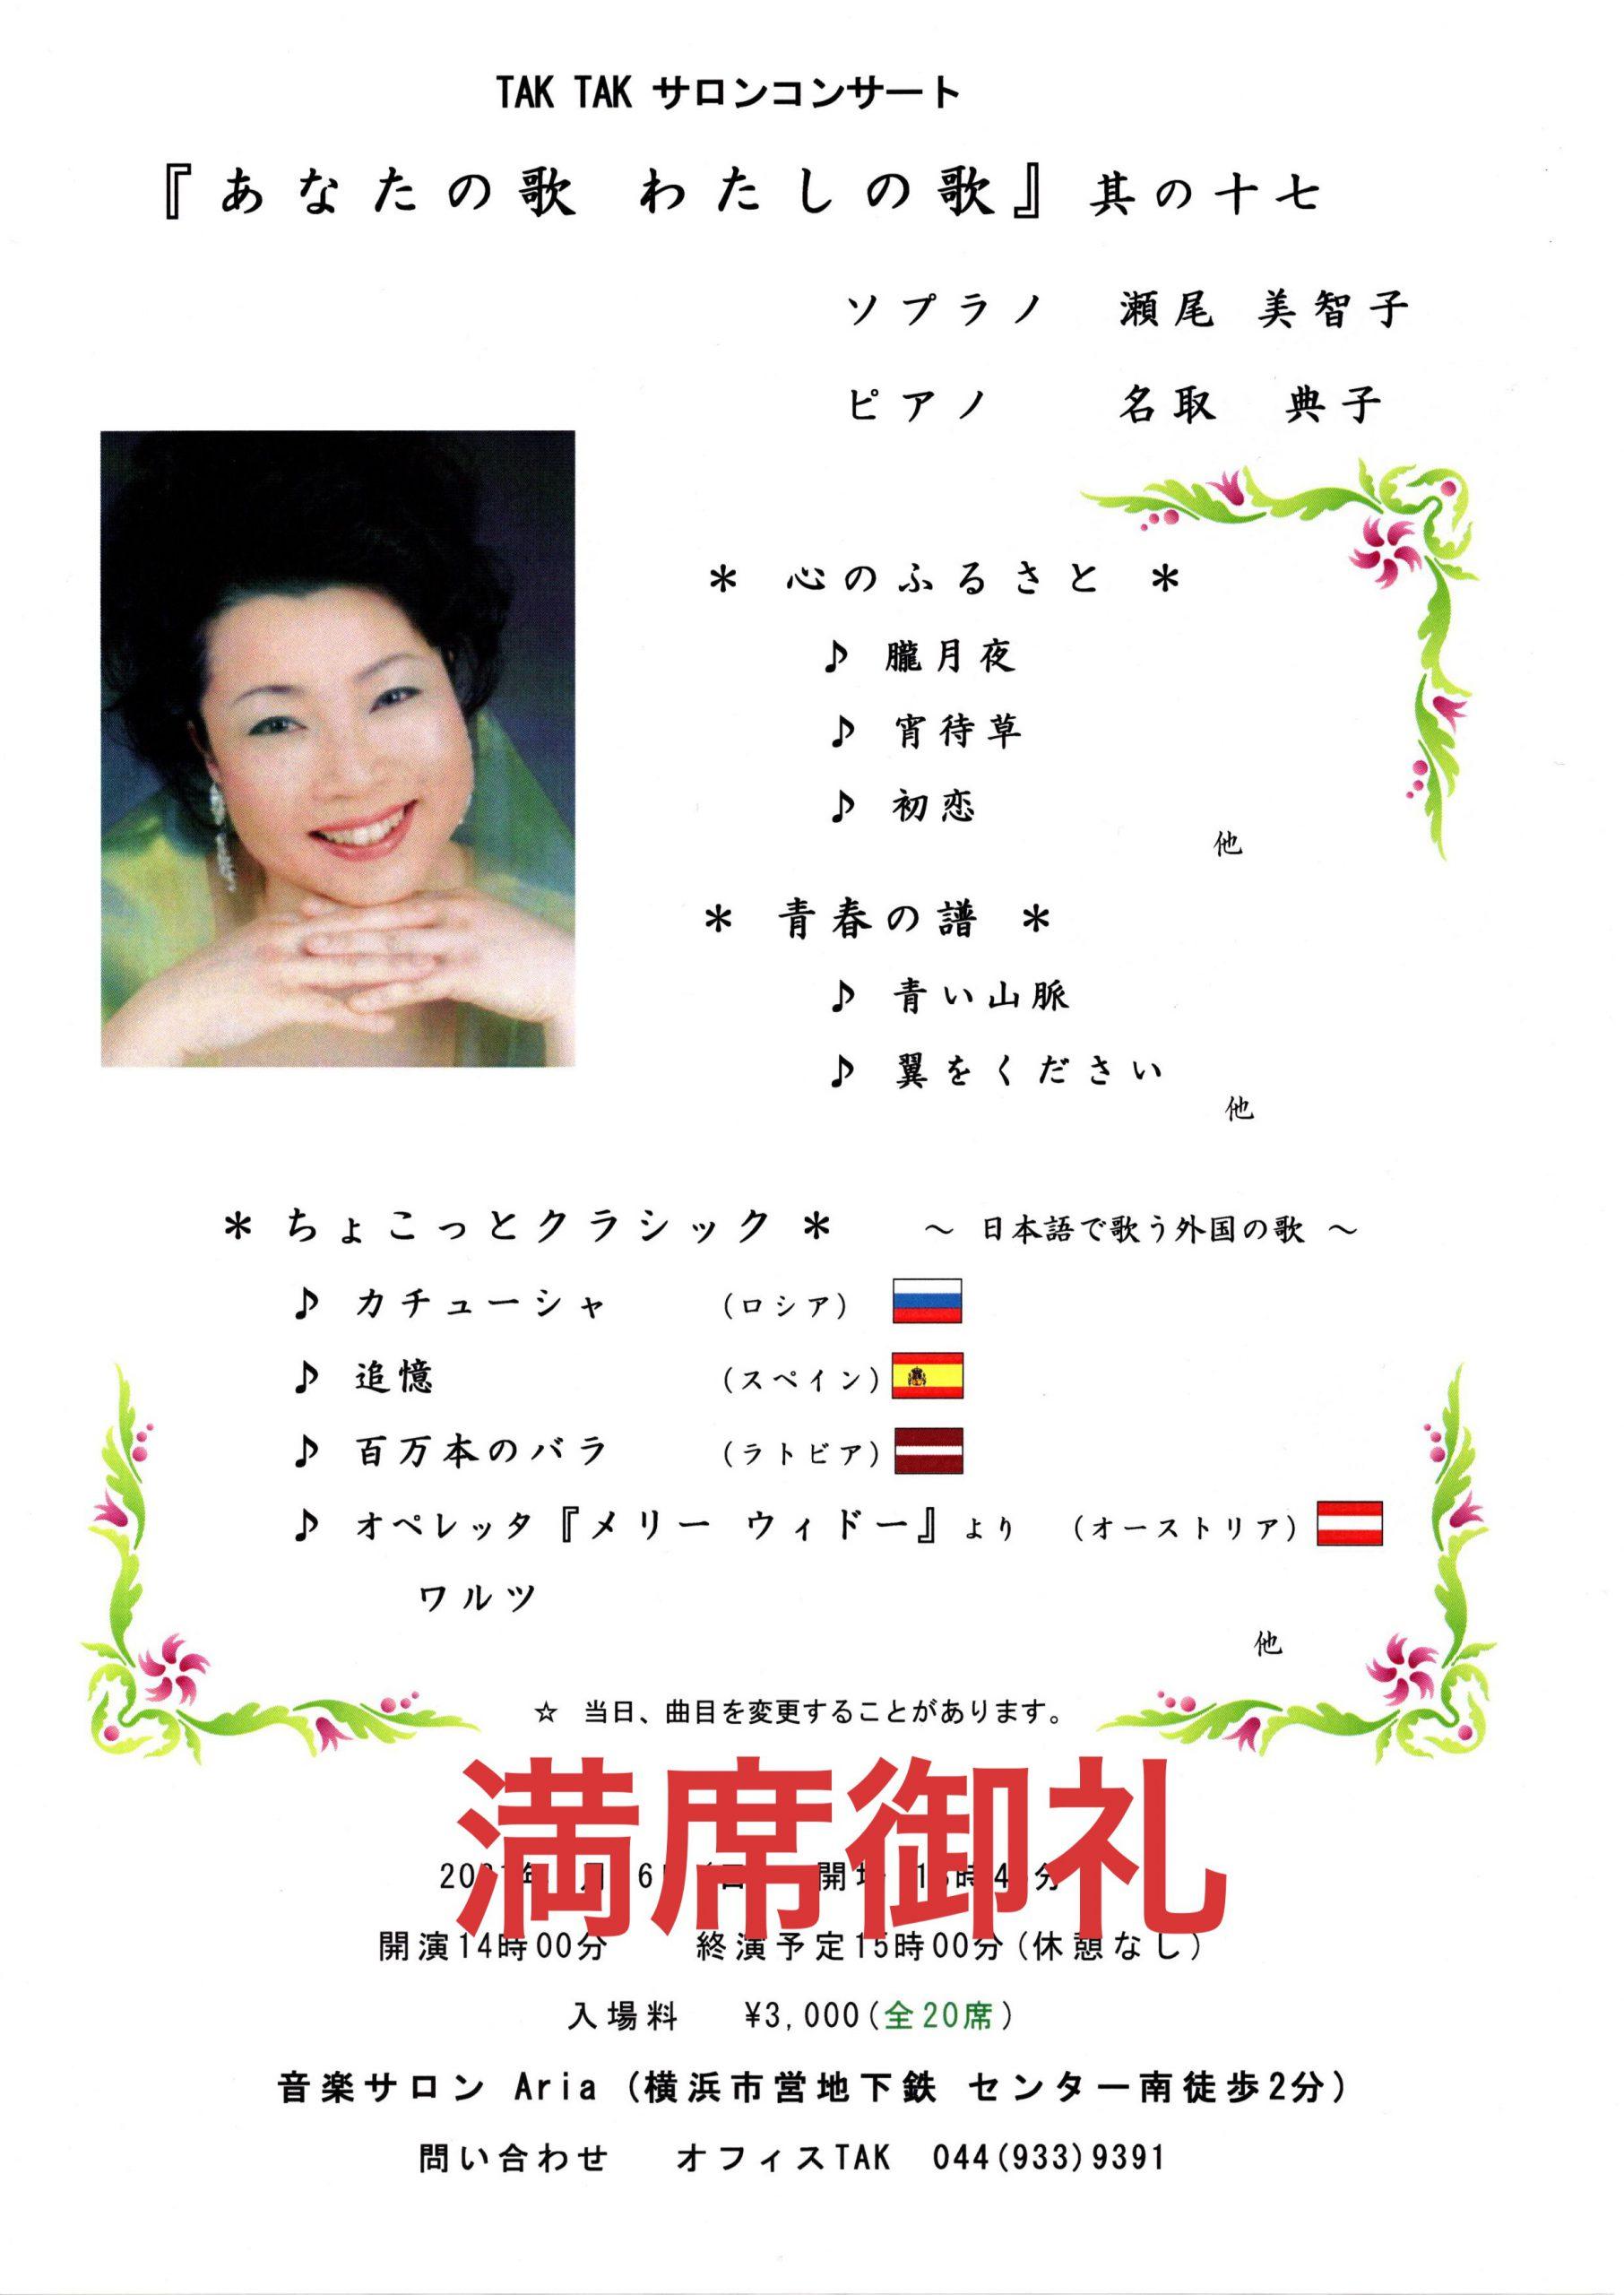 TAK TAK サロンコンサート ソプラノ 瀬尾 美智子 / ピアノ 名取 典子